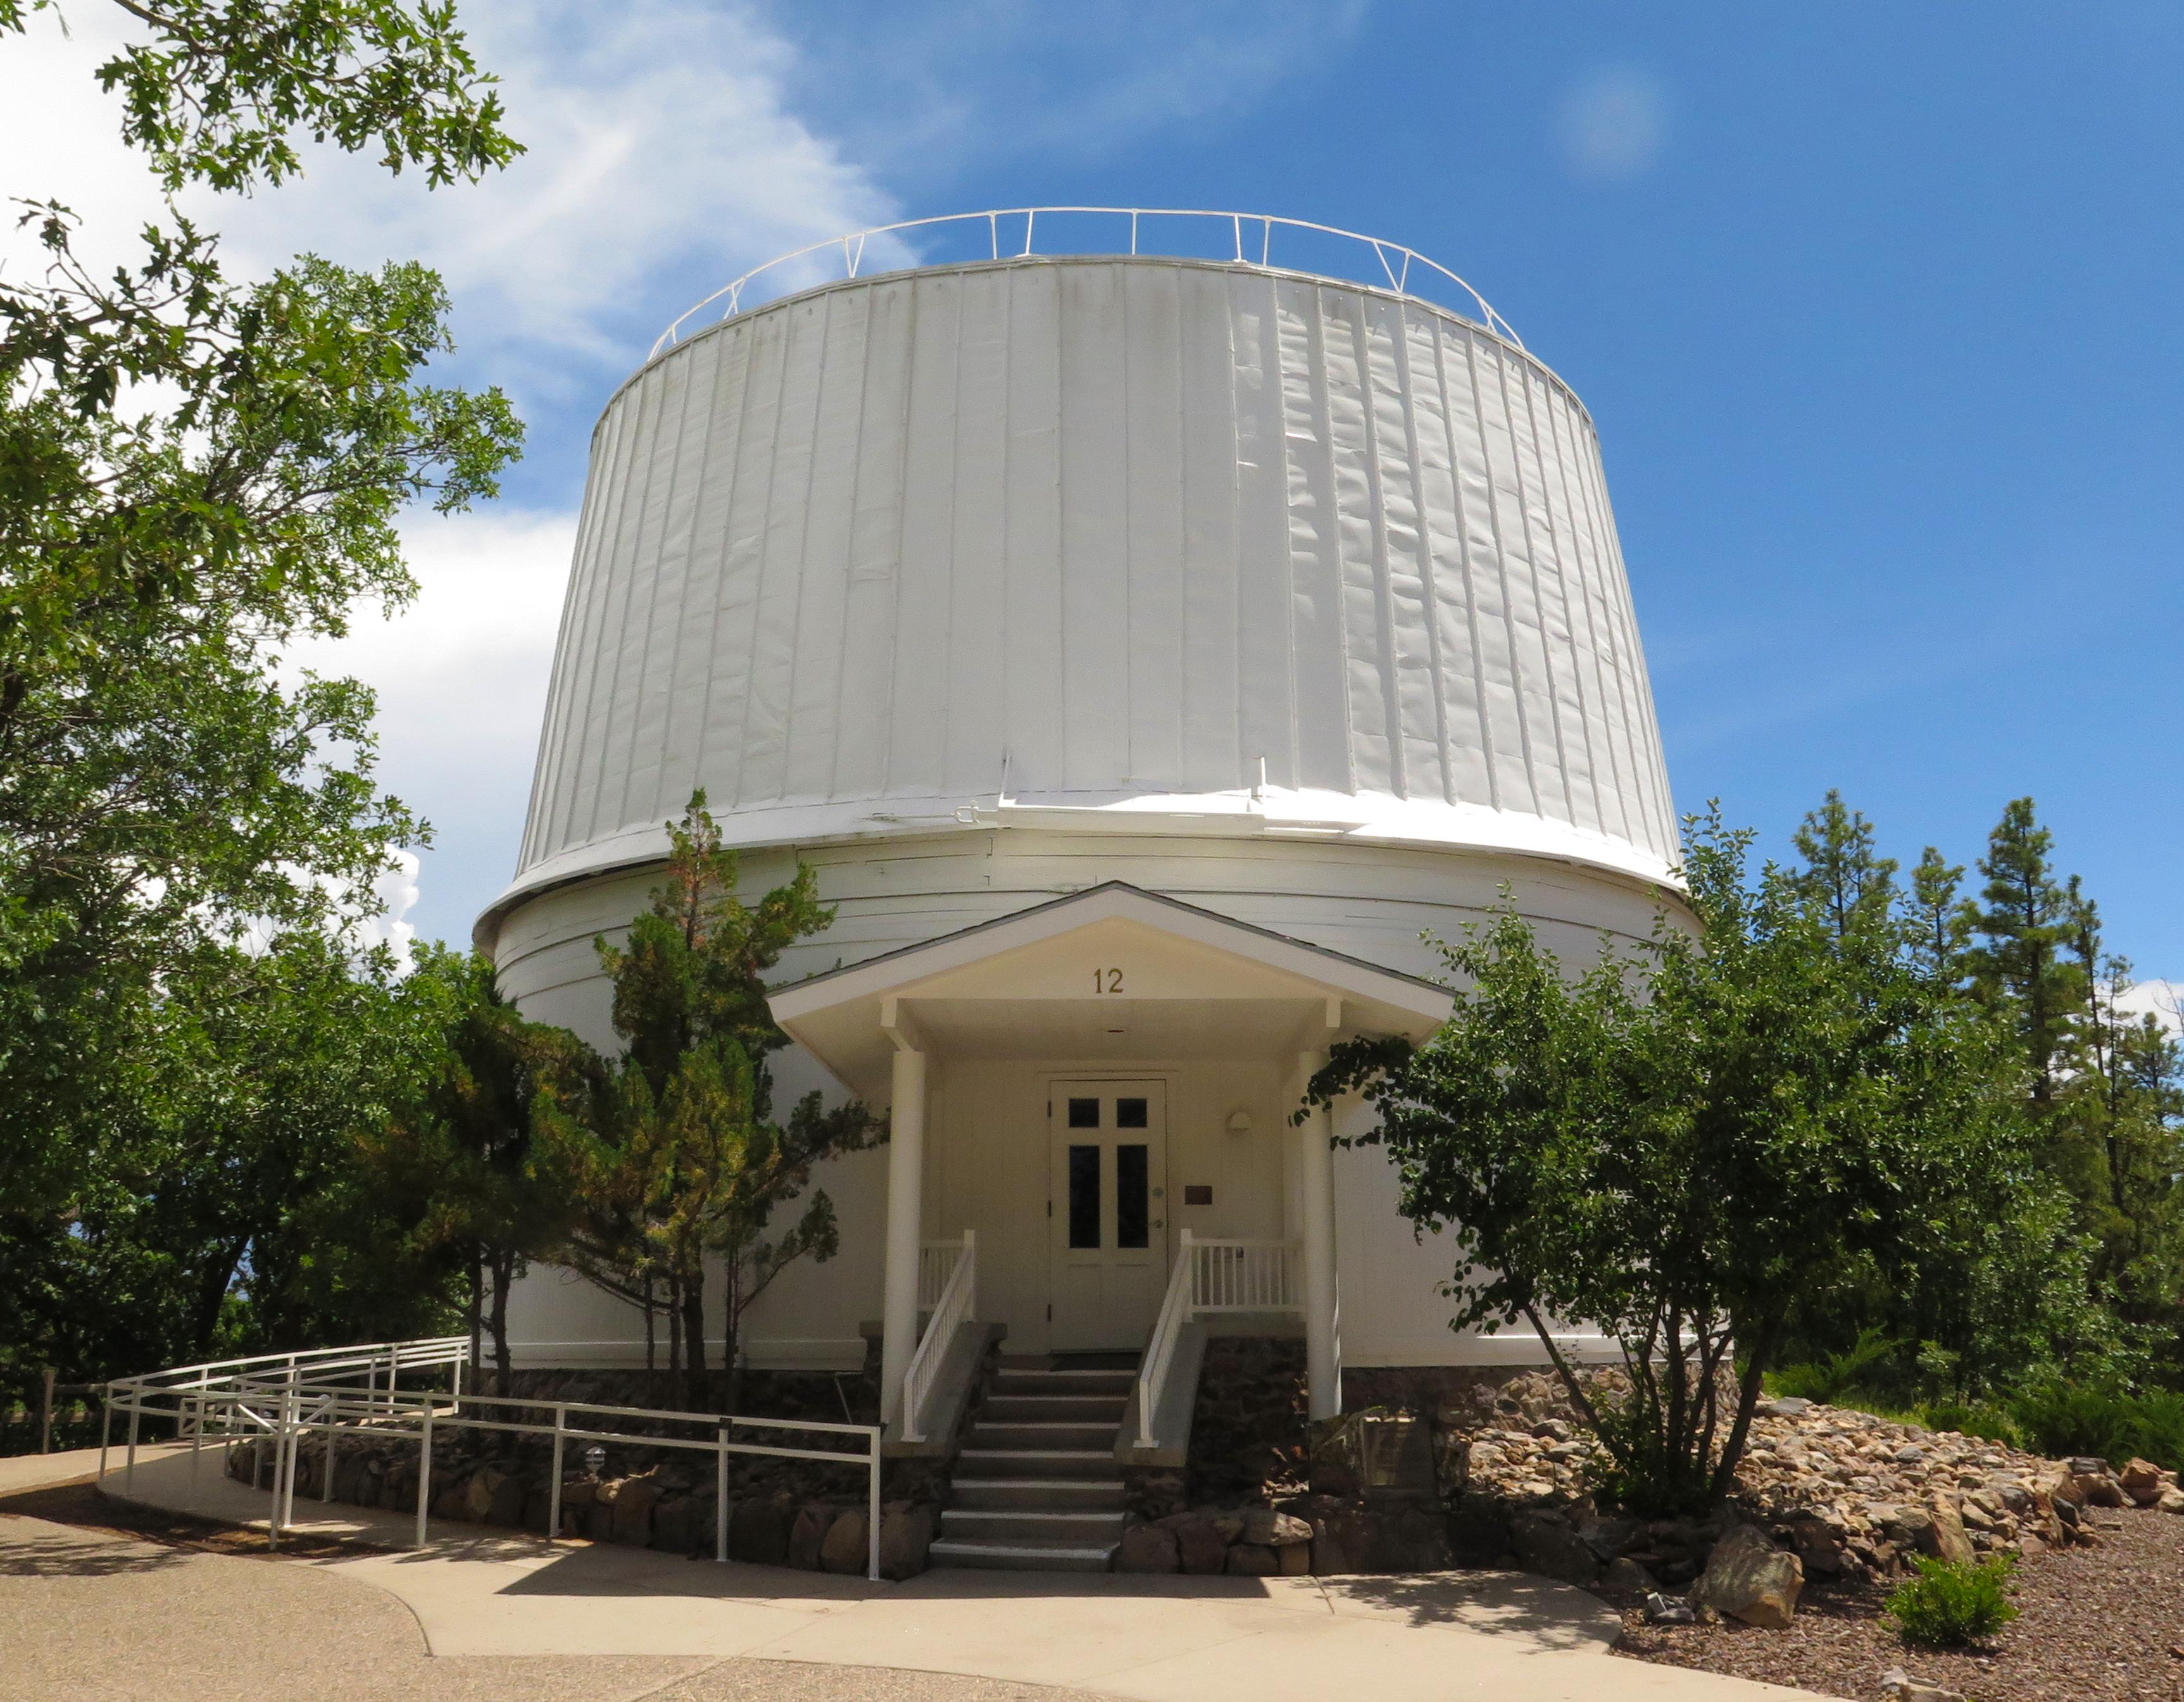 Lowell Observatory NRIS-66000172-Clark Telescope1-Flagstaff Arizona.jpg